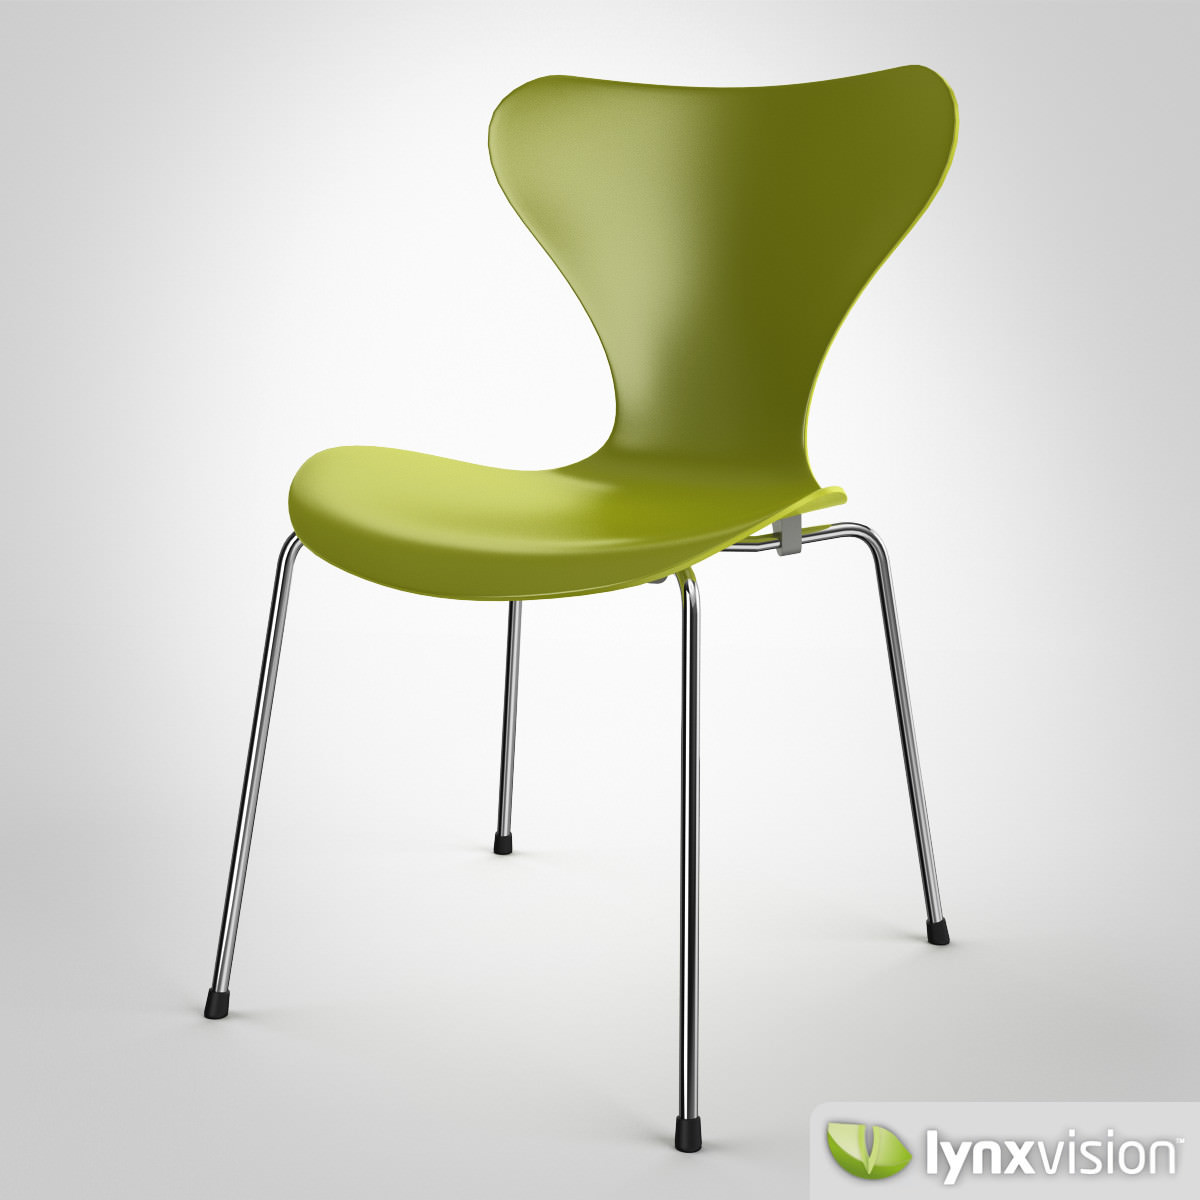 ... Serie 7 Chair By Arne Jacobsen 3d Model Max Obj Fbx Mtl 2 ...